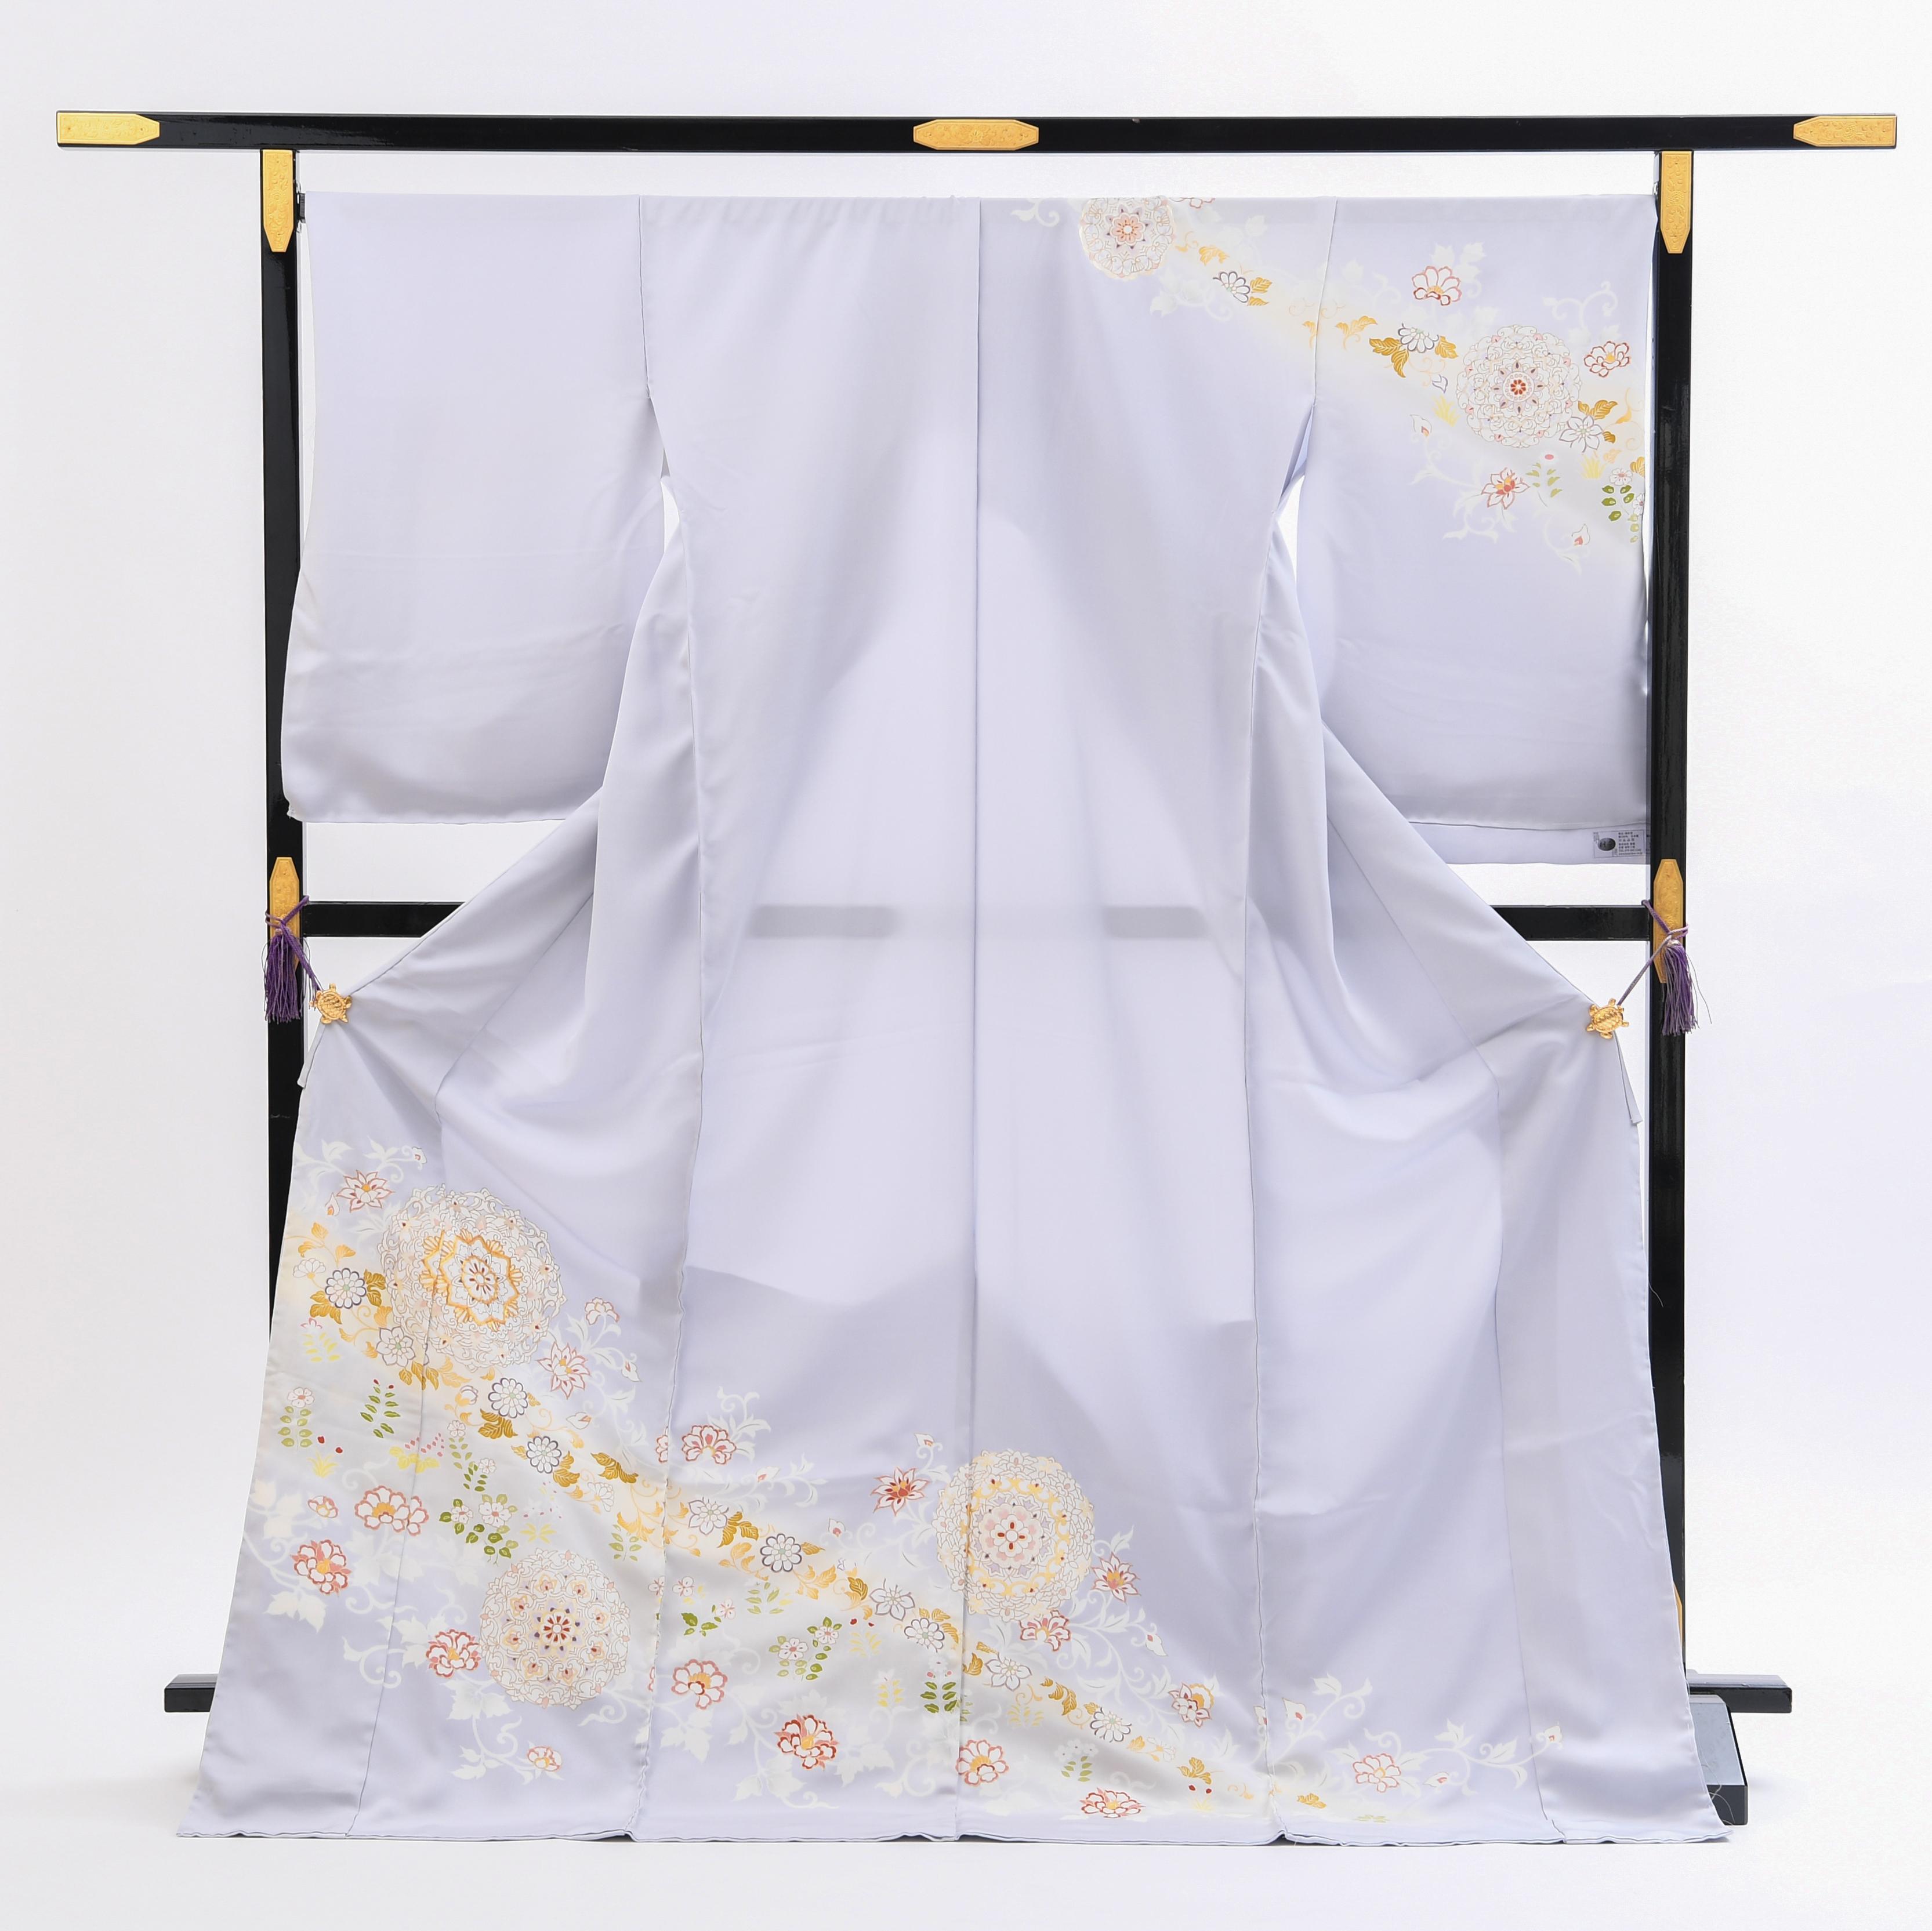 【高級訪問着レンタル】菱健謹製「淡い藤色系・正倉院文様」品番:h-452